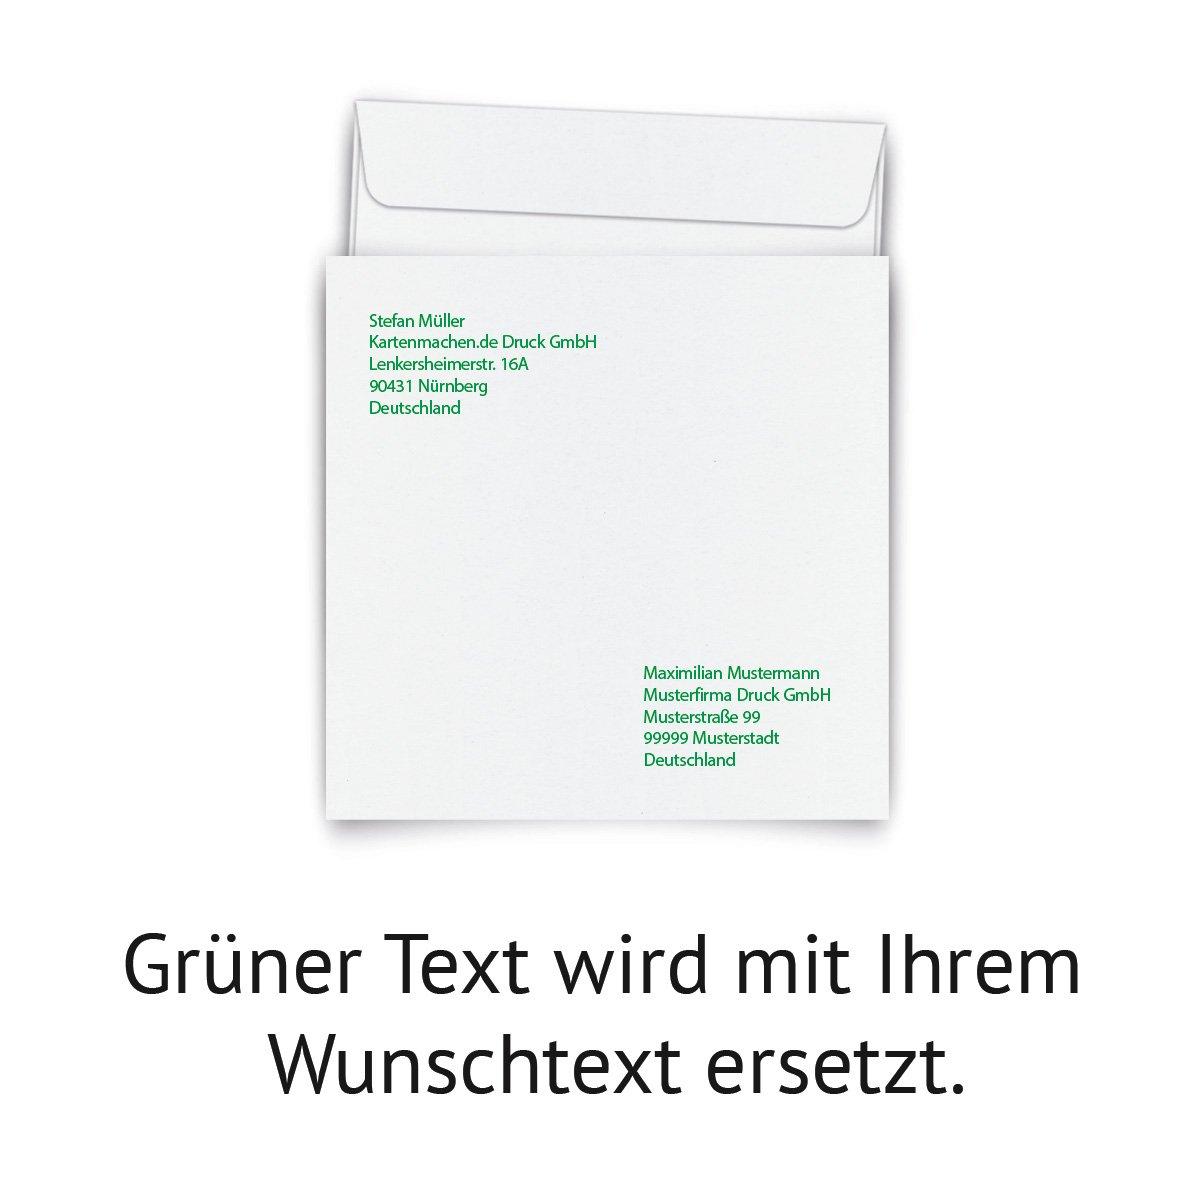 100 100 100 x Personalisierte Briefumschläge Quadrat 155 x 155 mm - Weiß individuell bedruckt B075821PVX | Ruf zuerst  | Modisch  | Modisch  8d823a